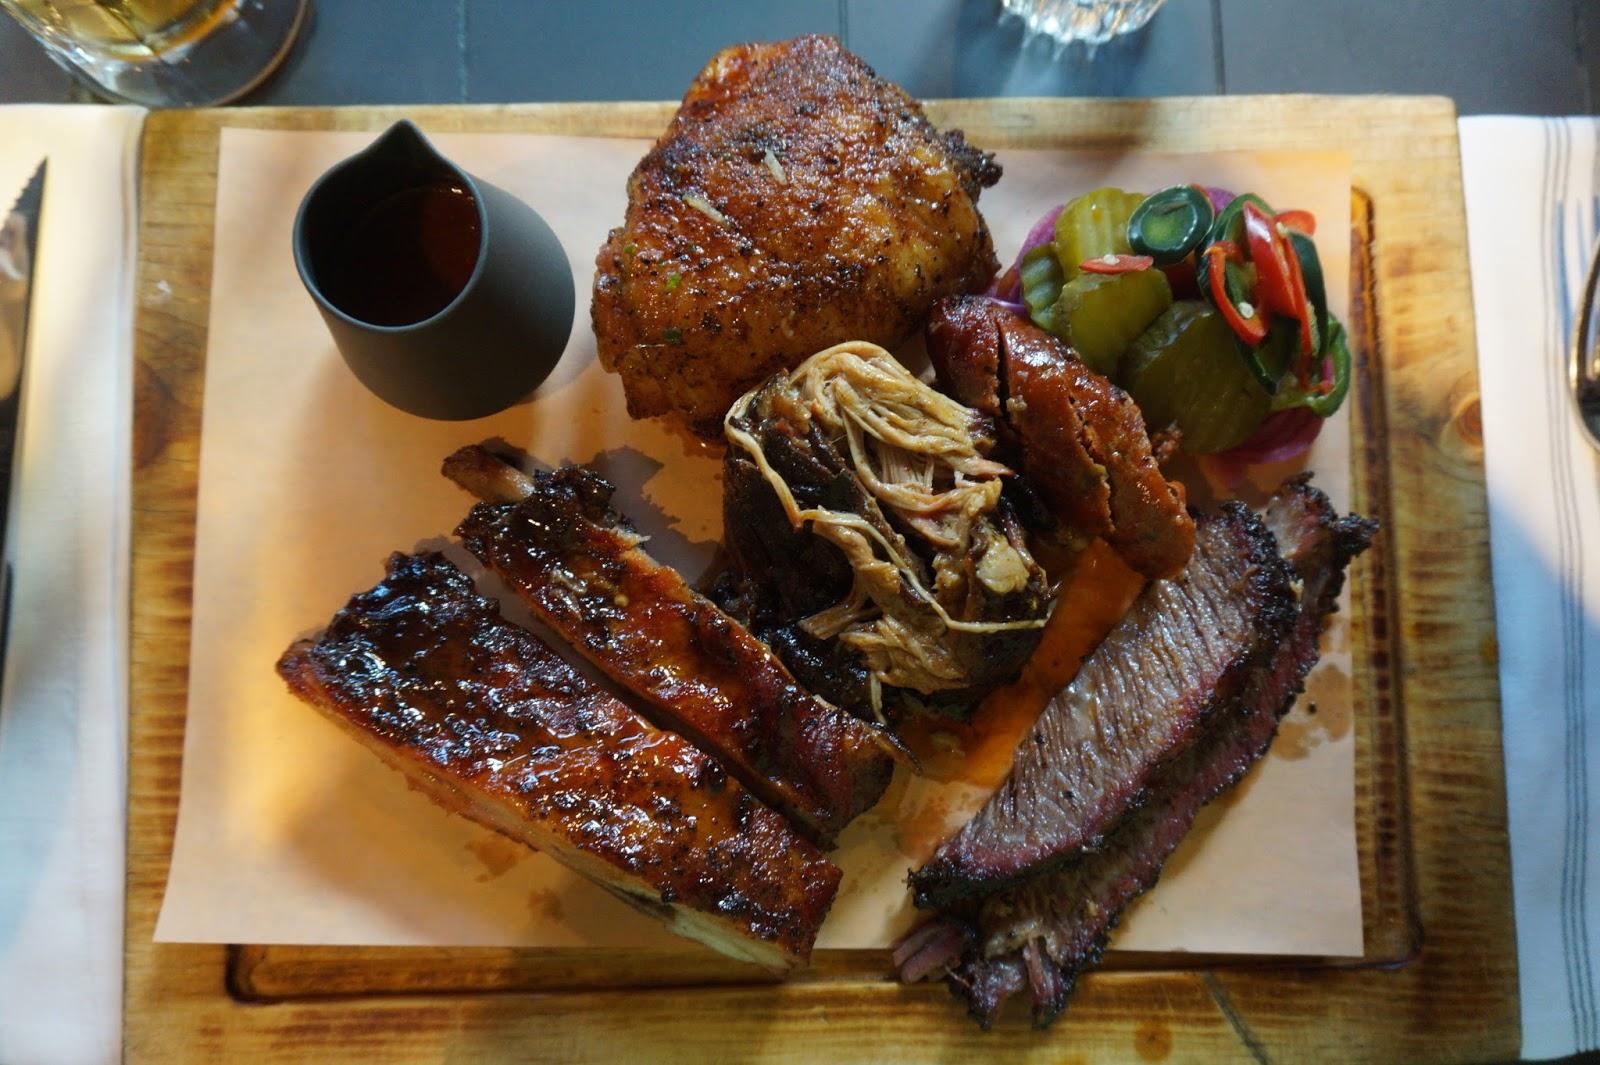 Platter of BBQ meats